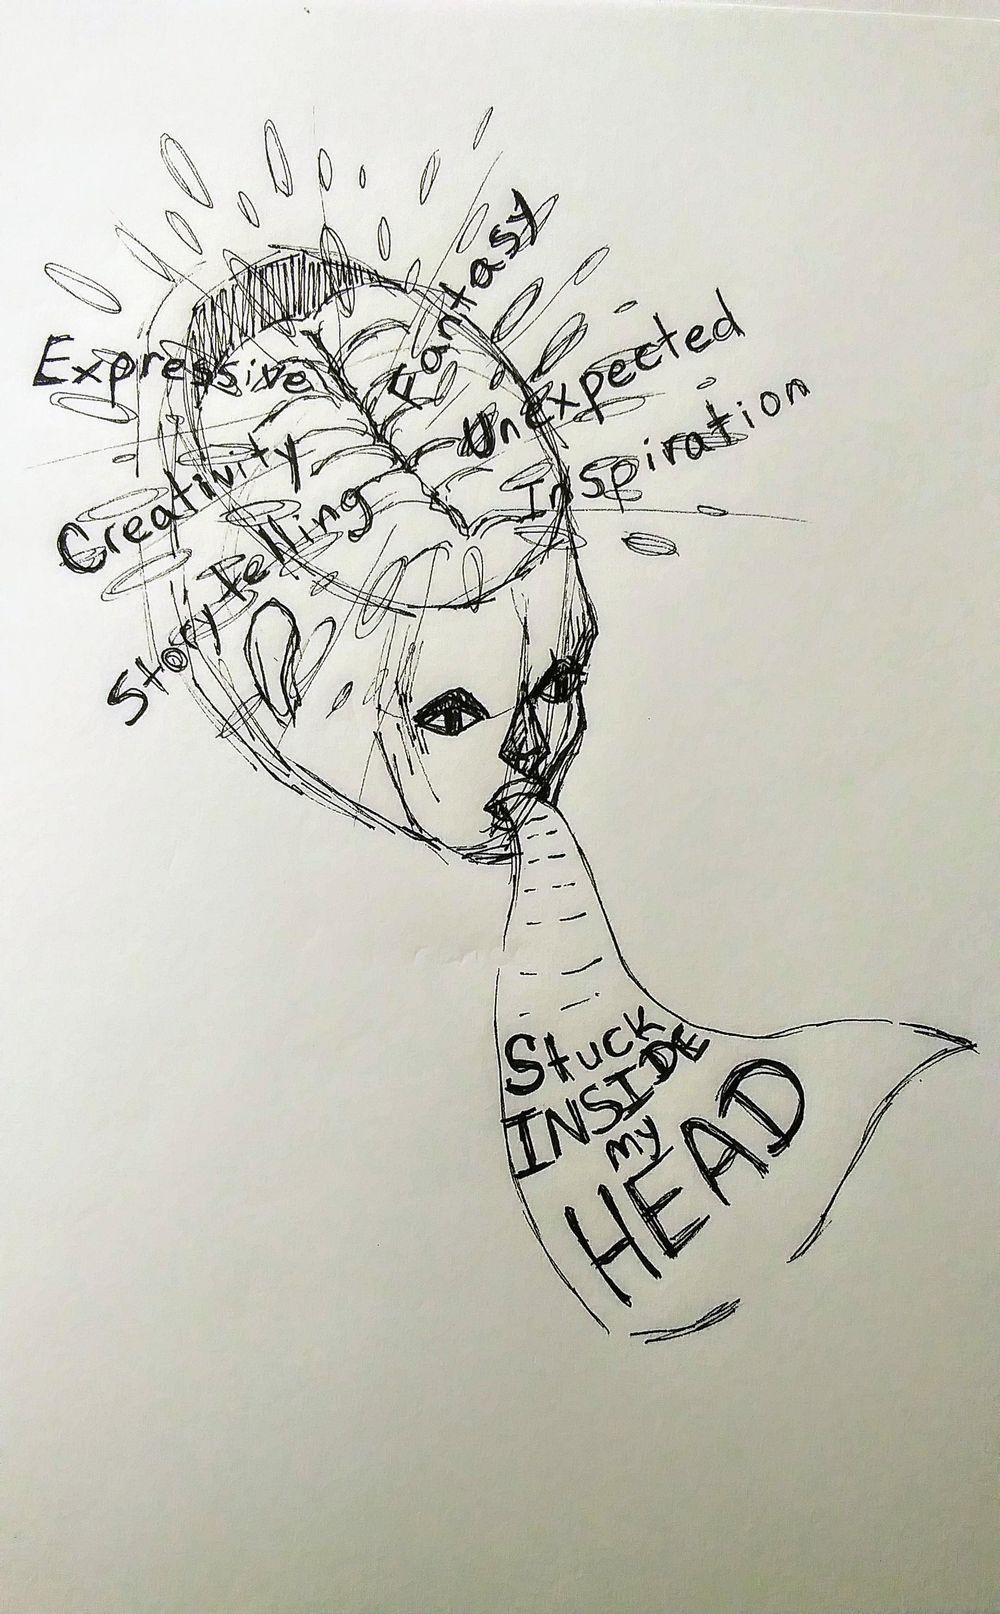 Iconic Illustration - image 2 - student project